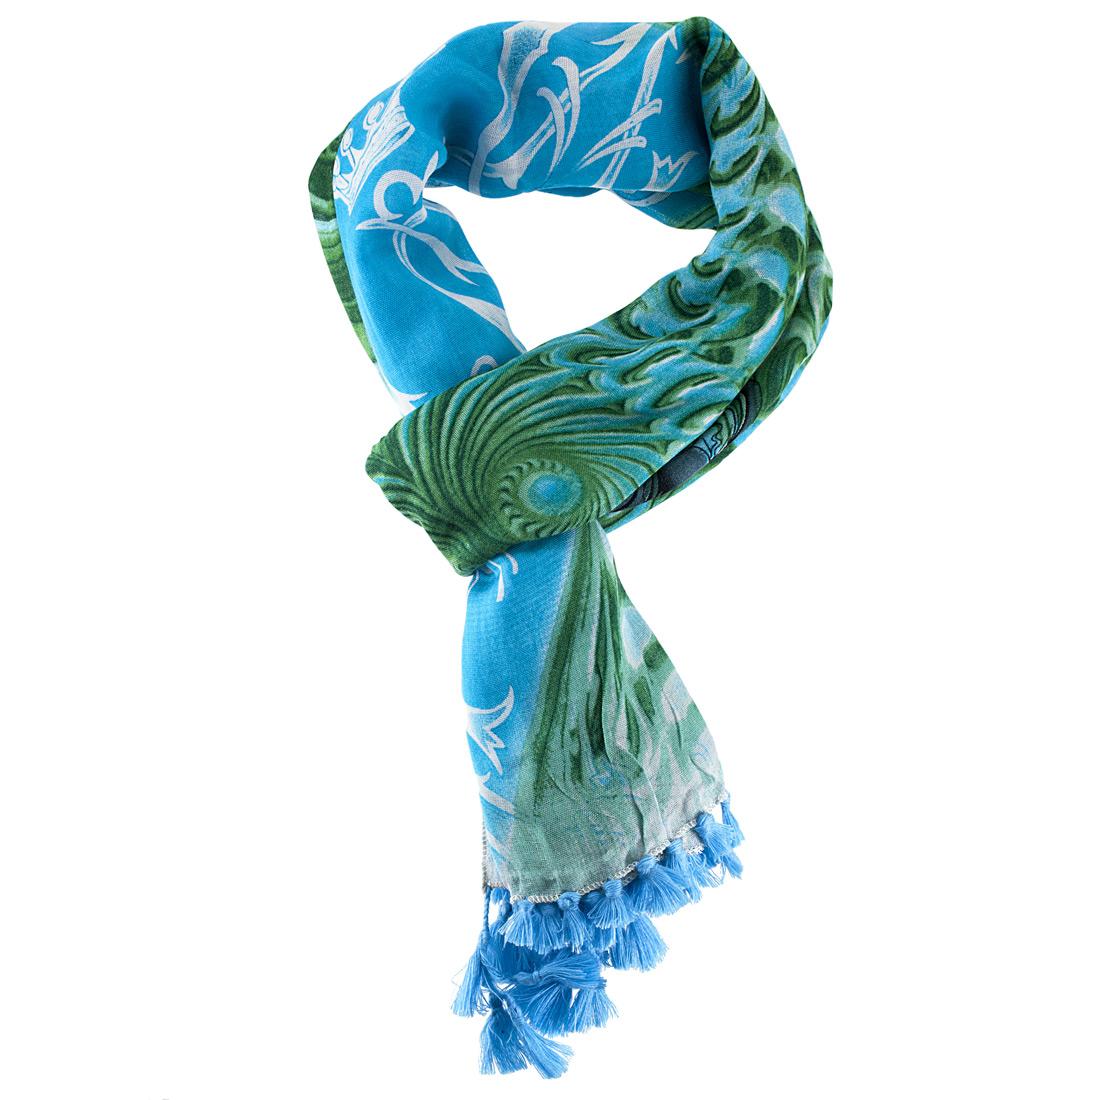 christian audigier 60x40 bird fringe scarf ebay